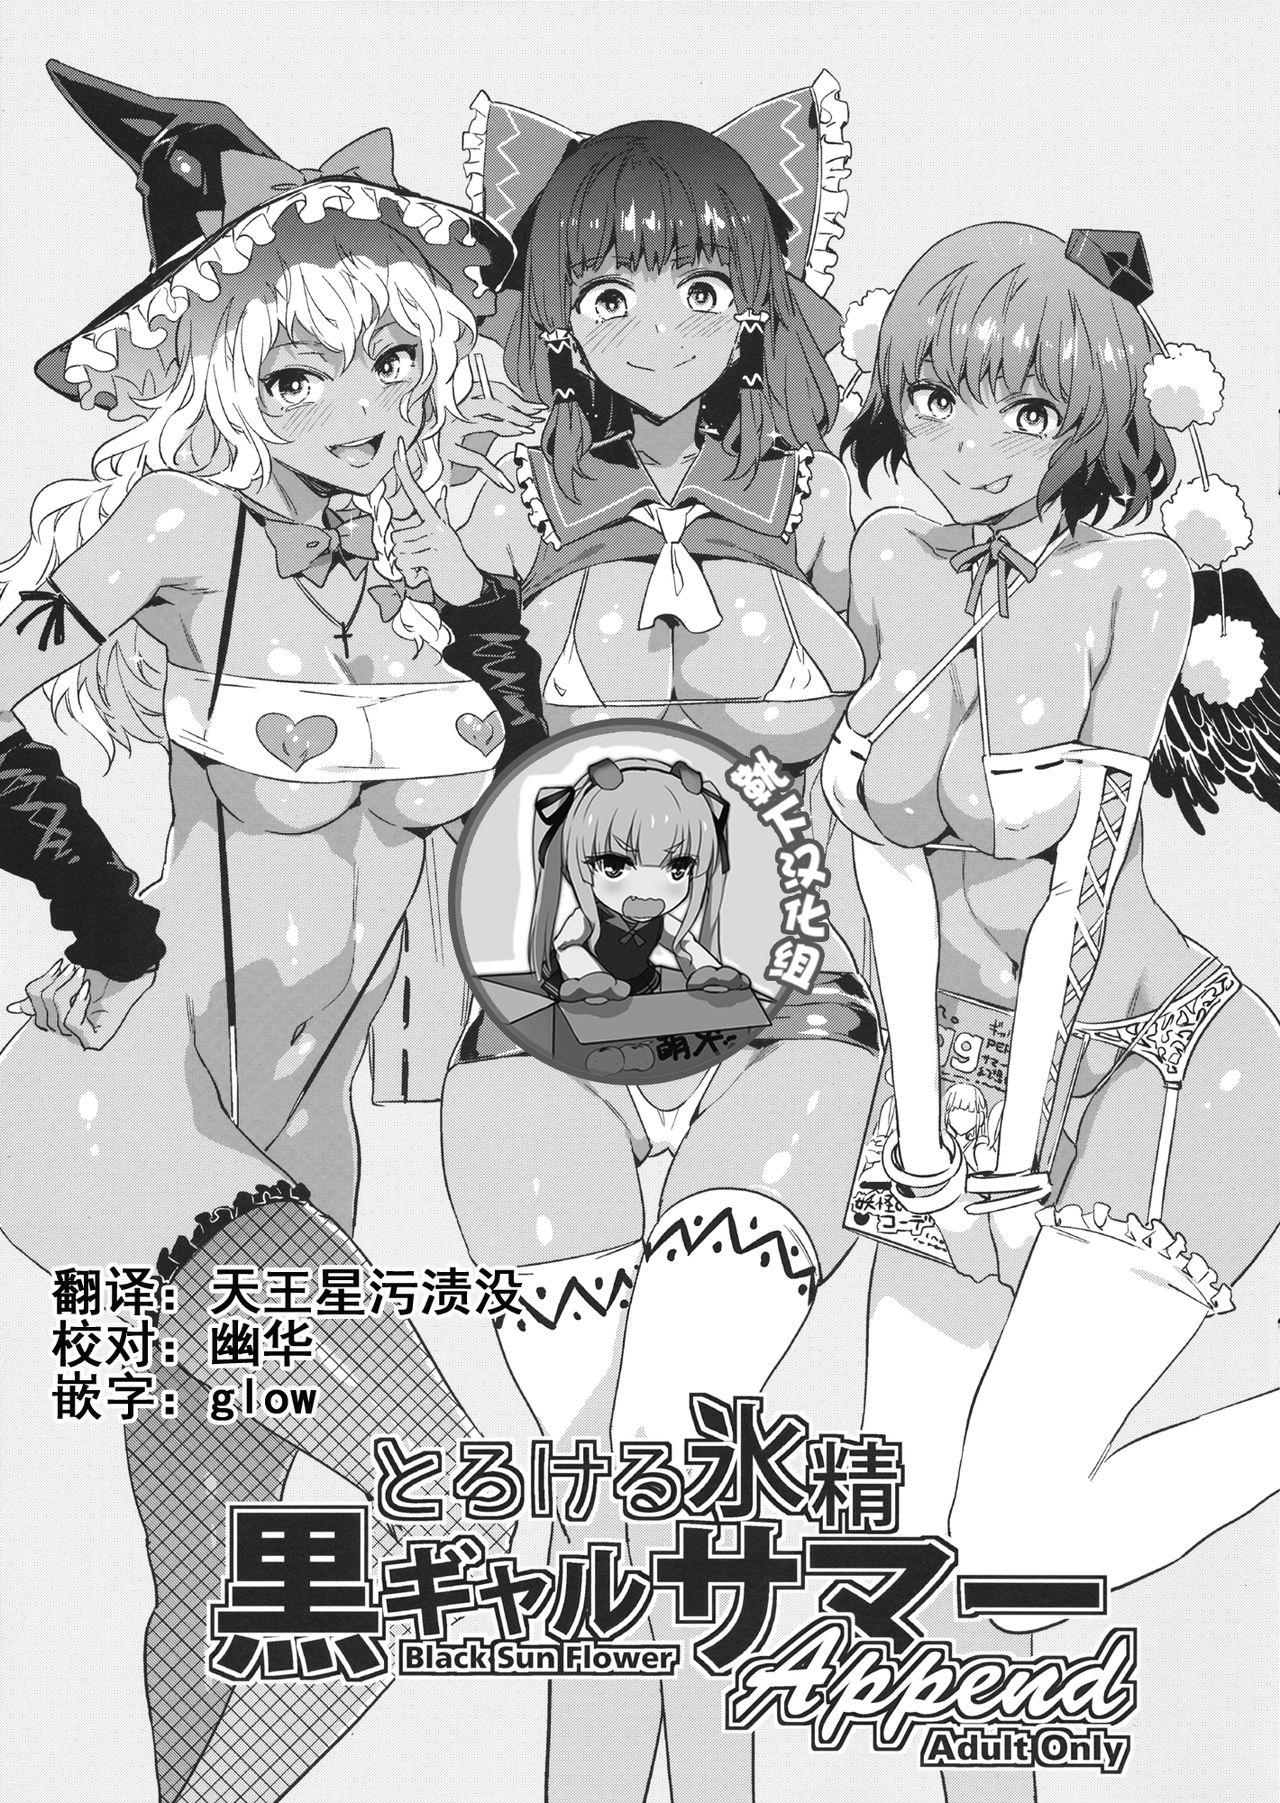 Torokeru Hyousei Kuro Gal Summer Append 0